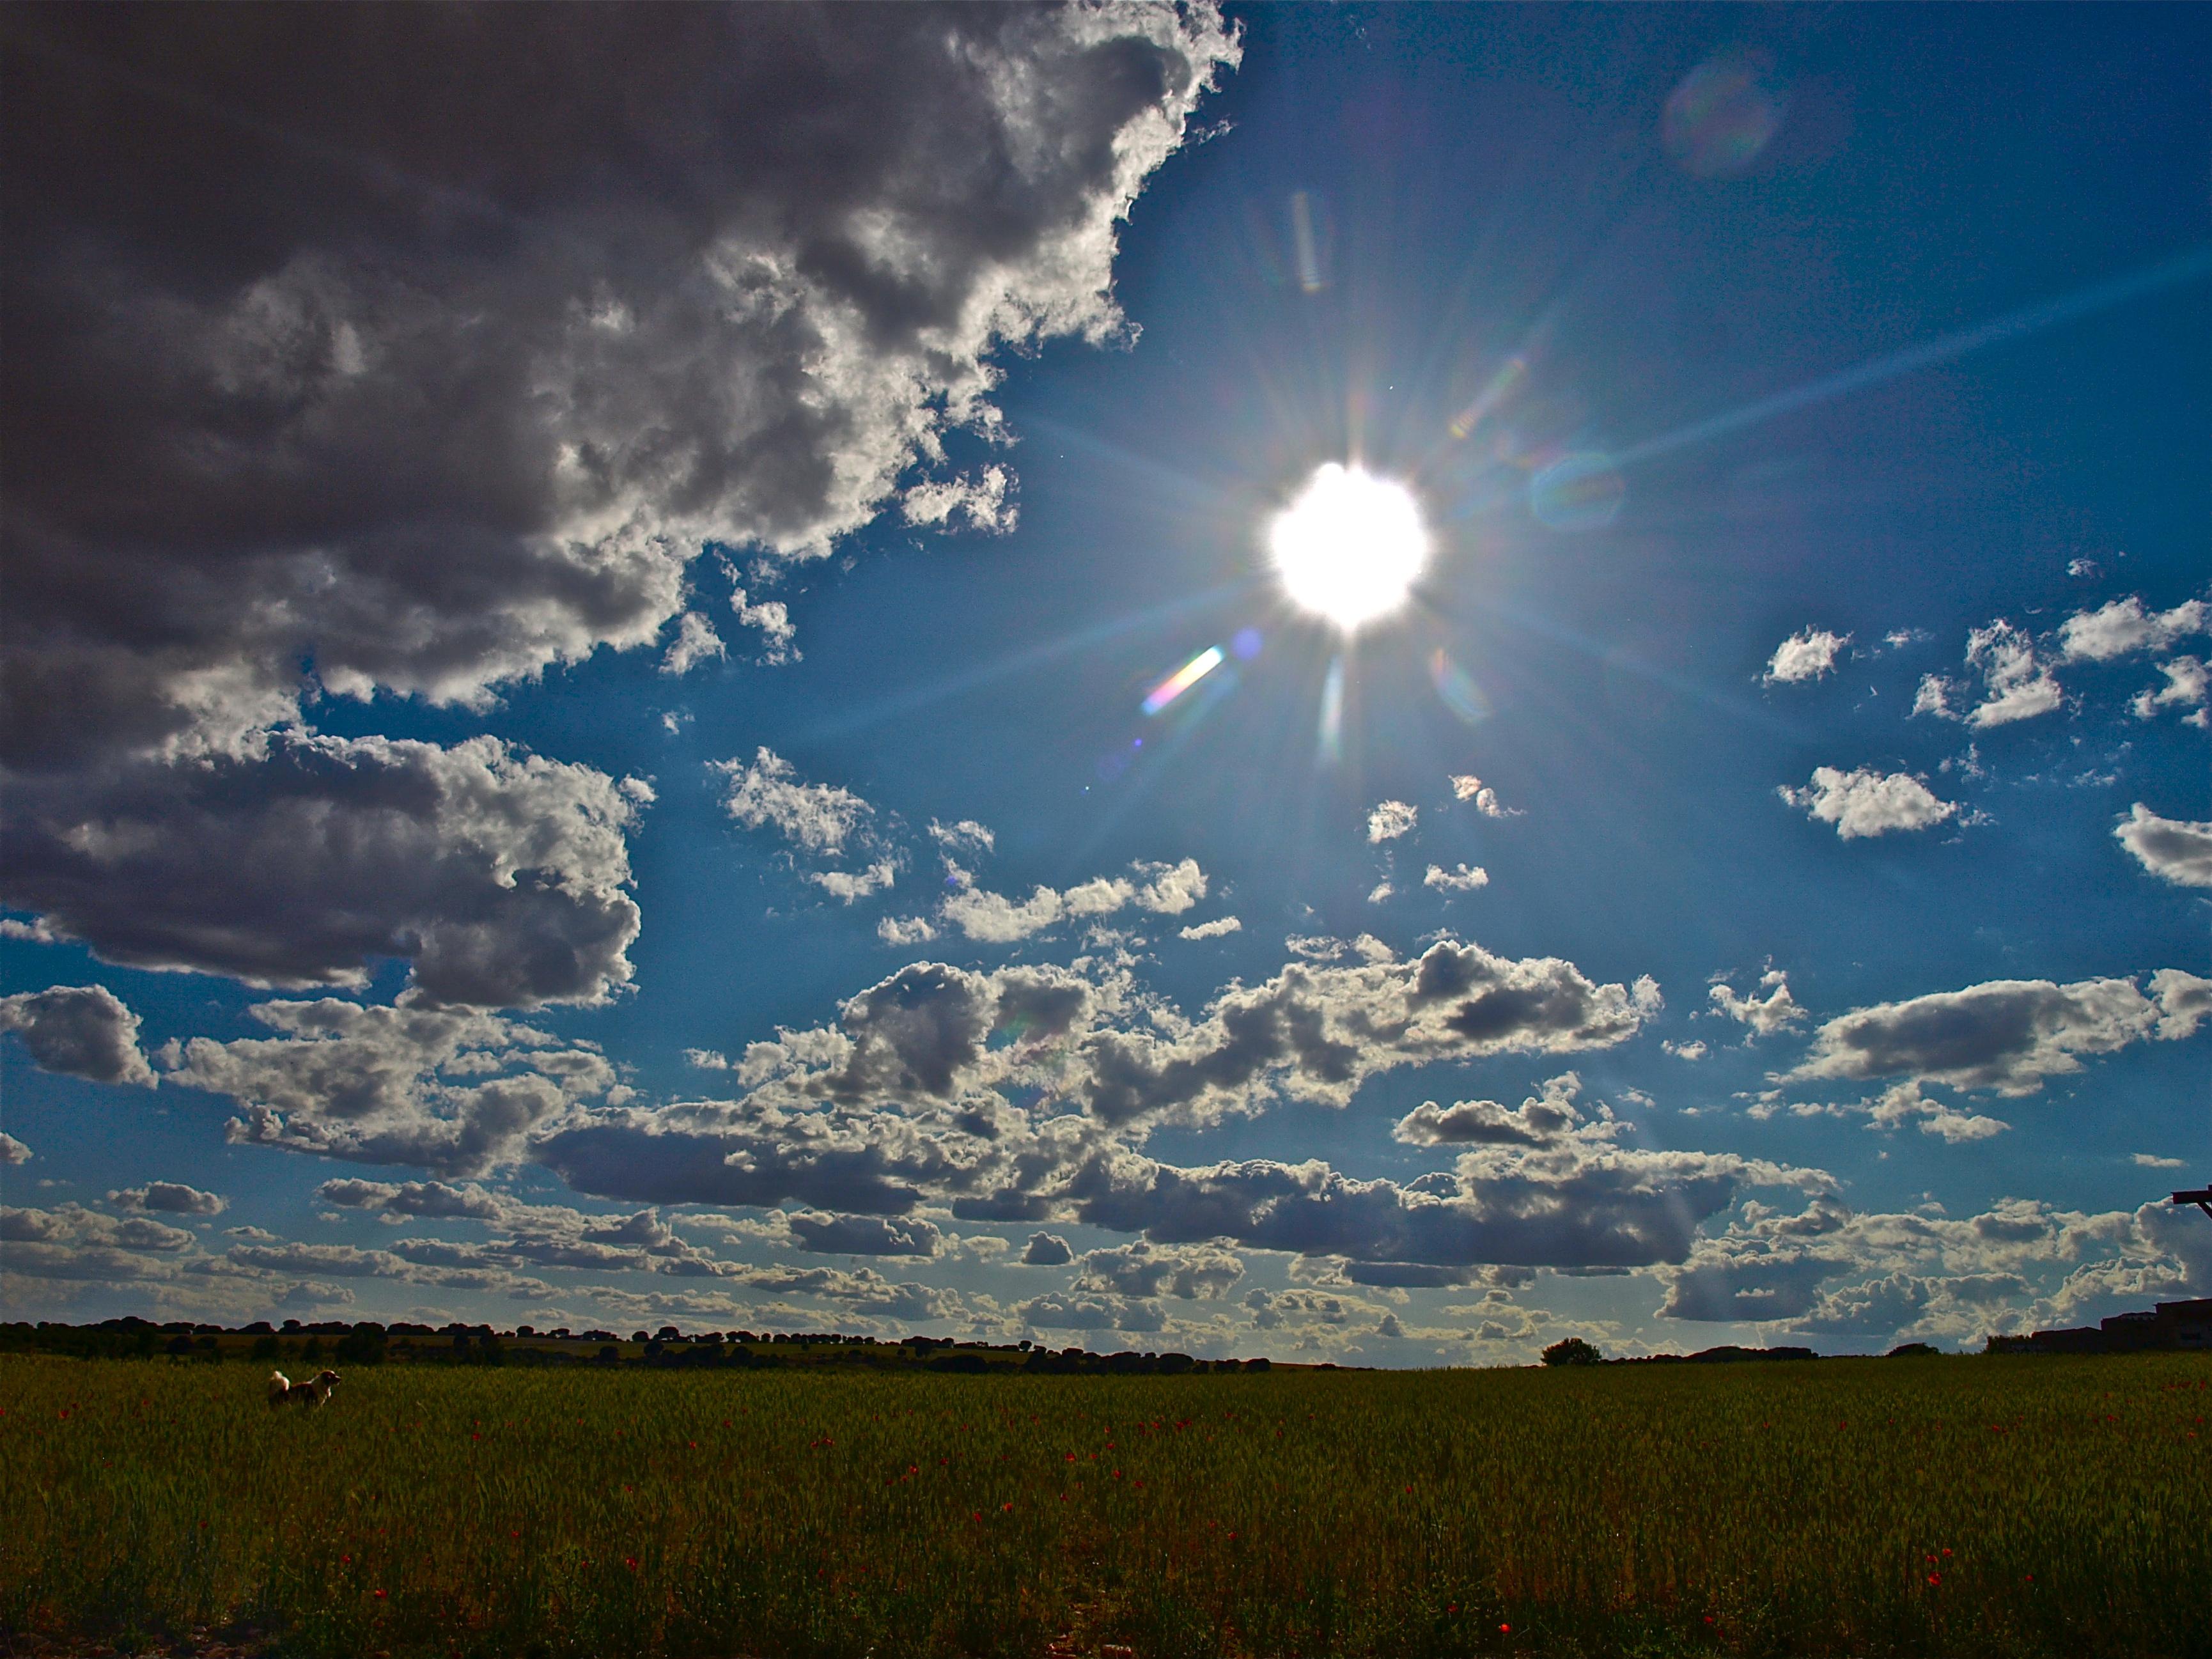 картинки неба ветра солнца парковке, прямо нашим